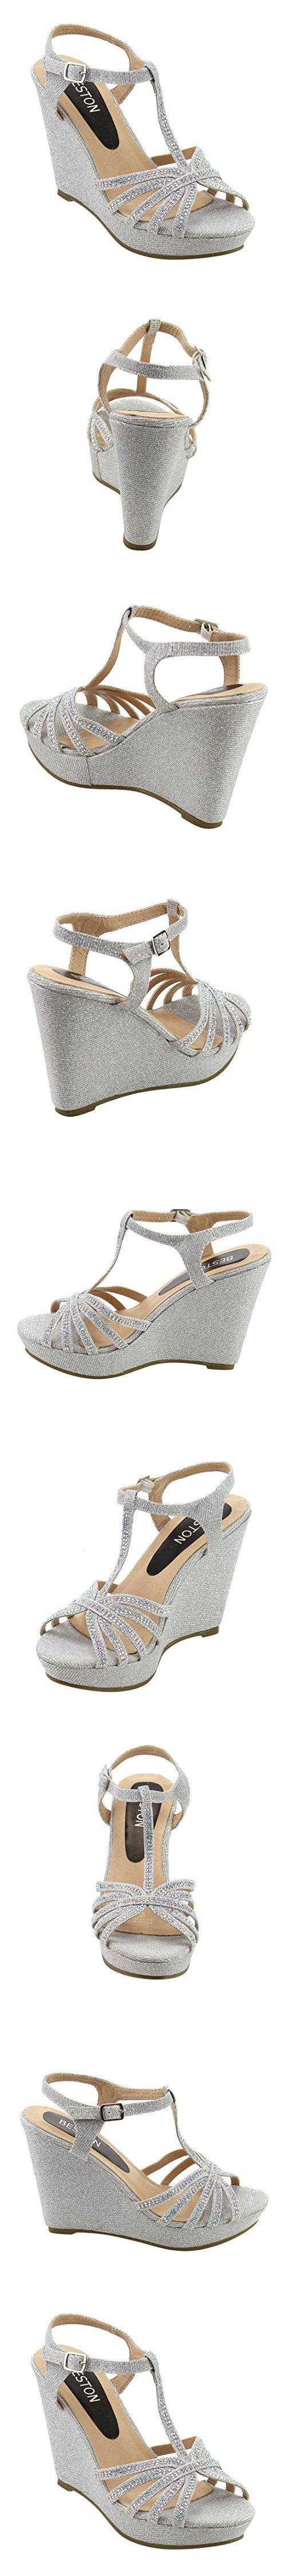 Beston ID68 Women's Glitter T-strap Cage Platform Wedge Dress Sandal, Color:SILVER, Size:7.5